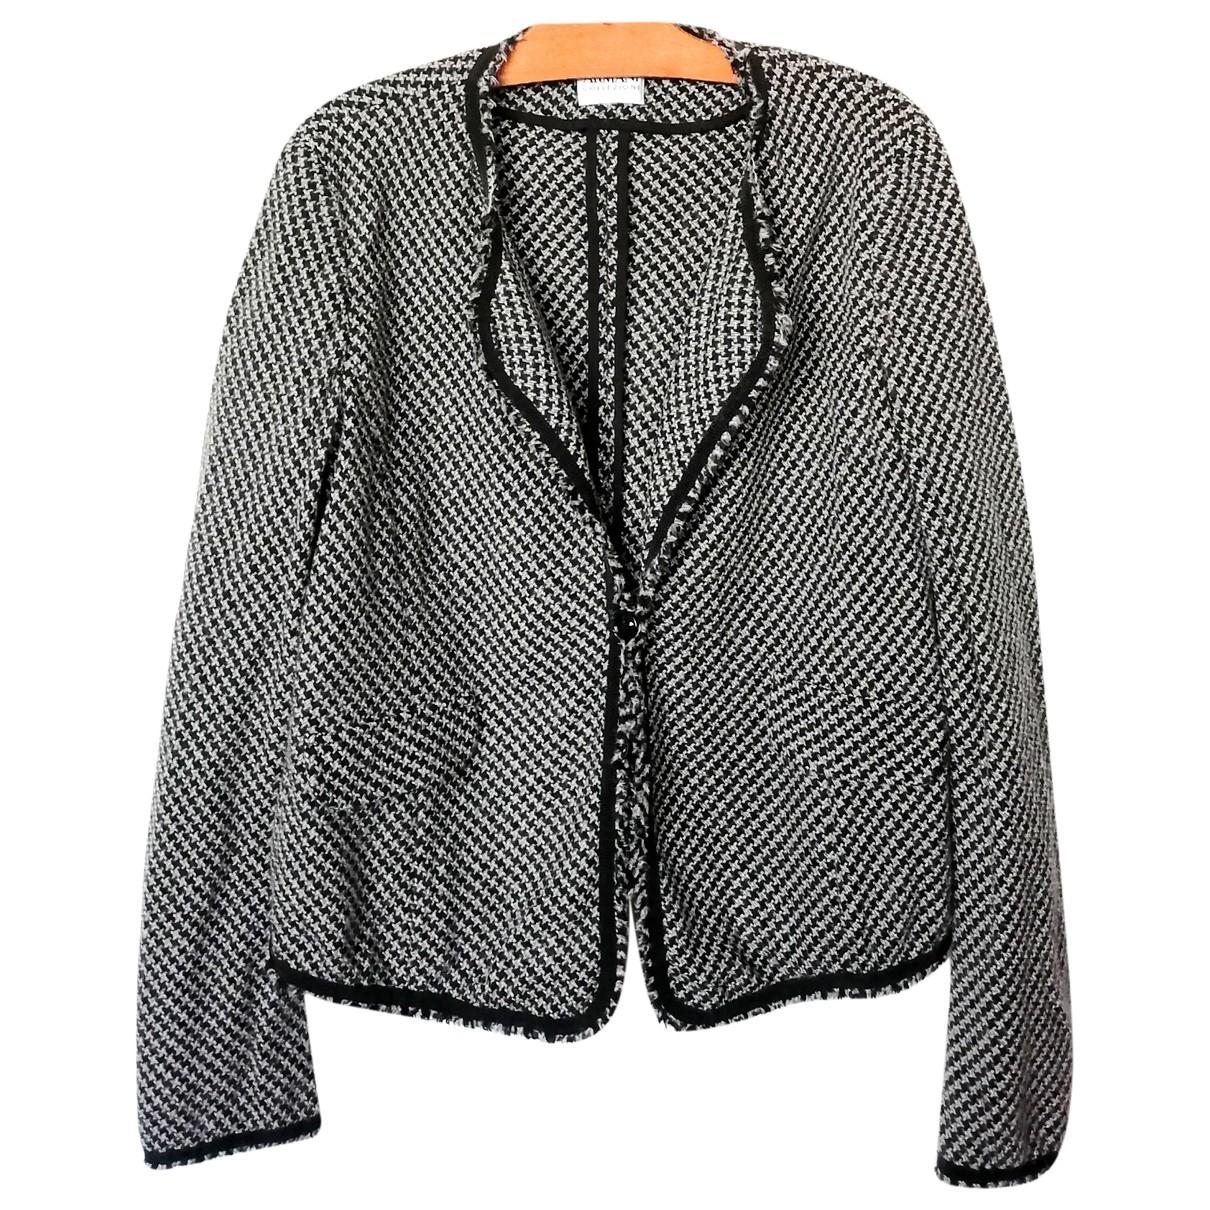 Armani Collezioni \N Jacke in  Schwarz Wolle